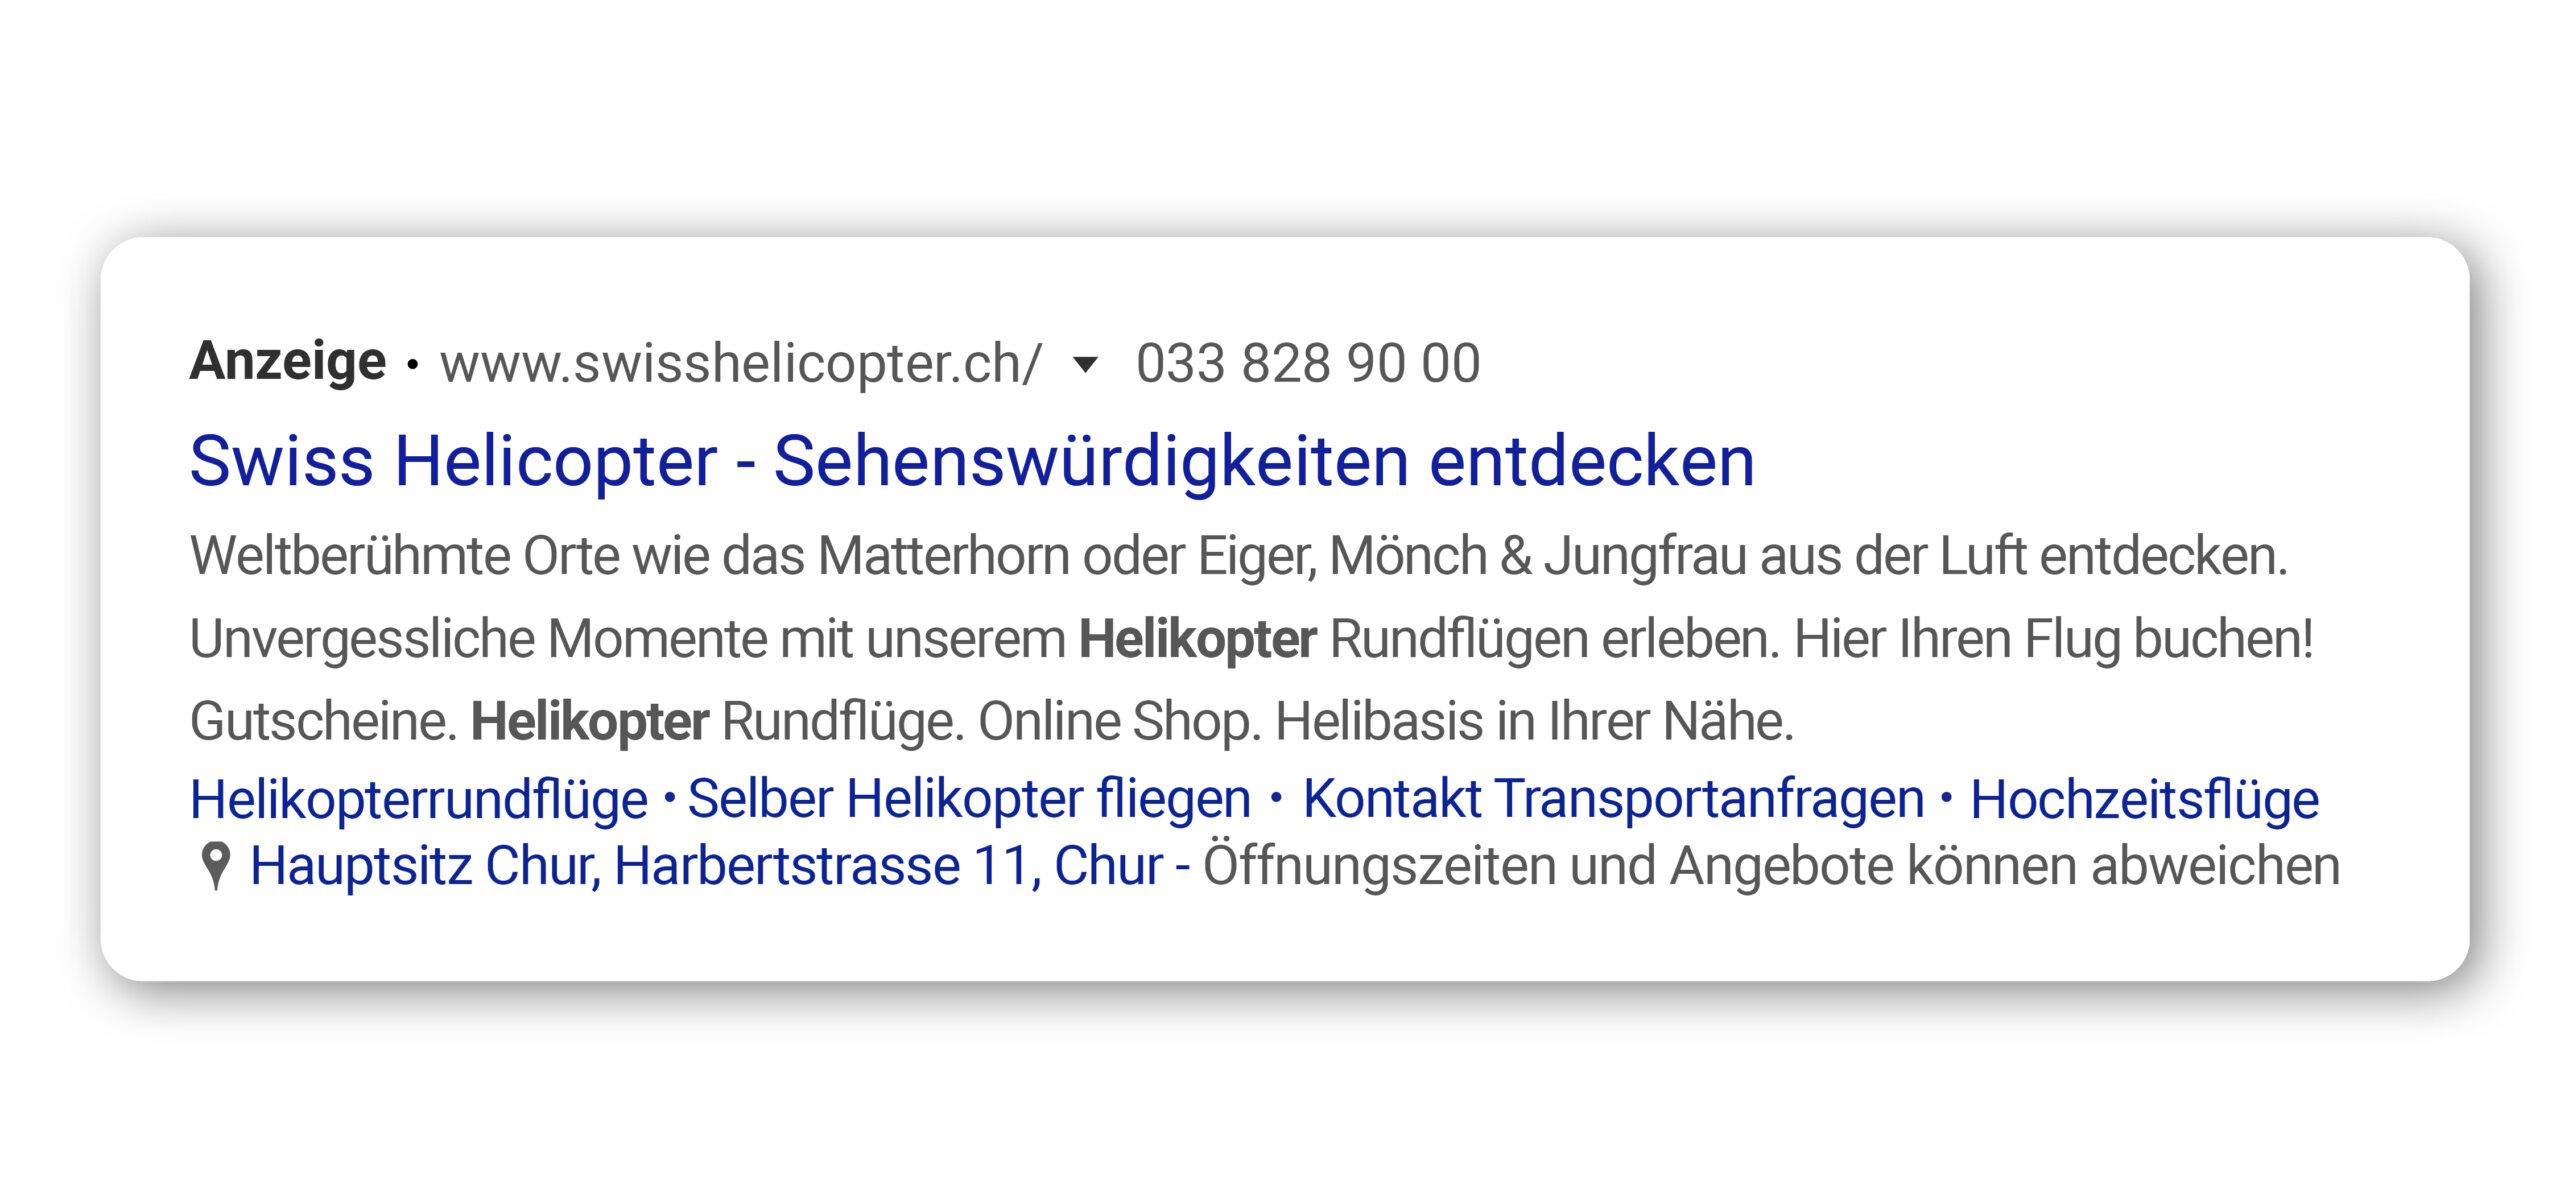 GoogleAds_SwissHelicopter2